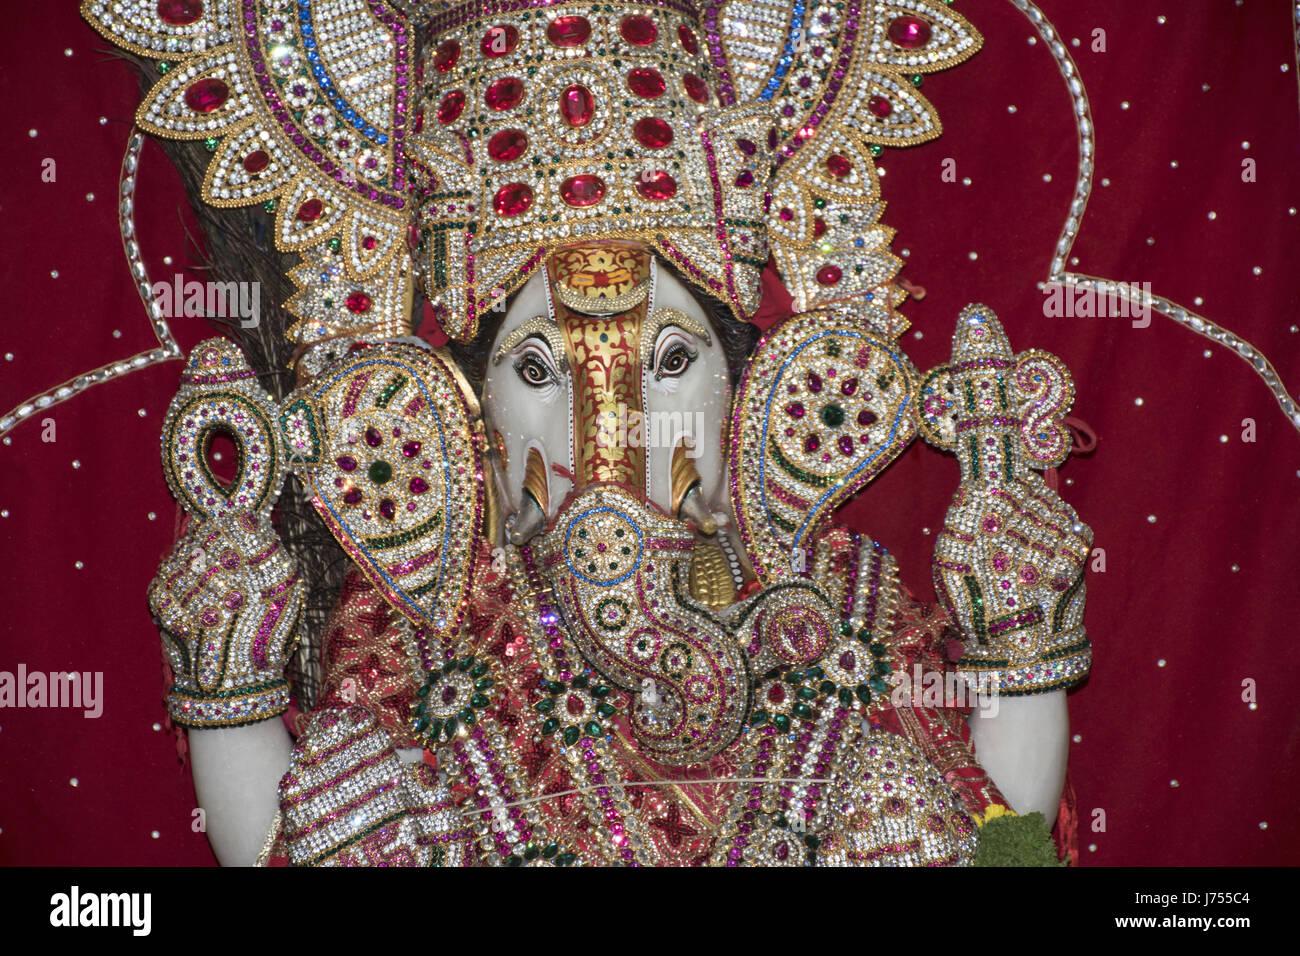 Ganpati bappa deity statue - Stock Image